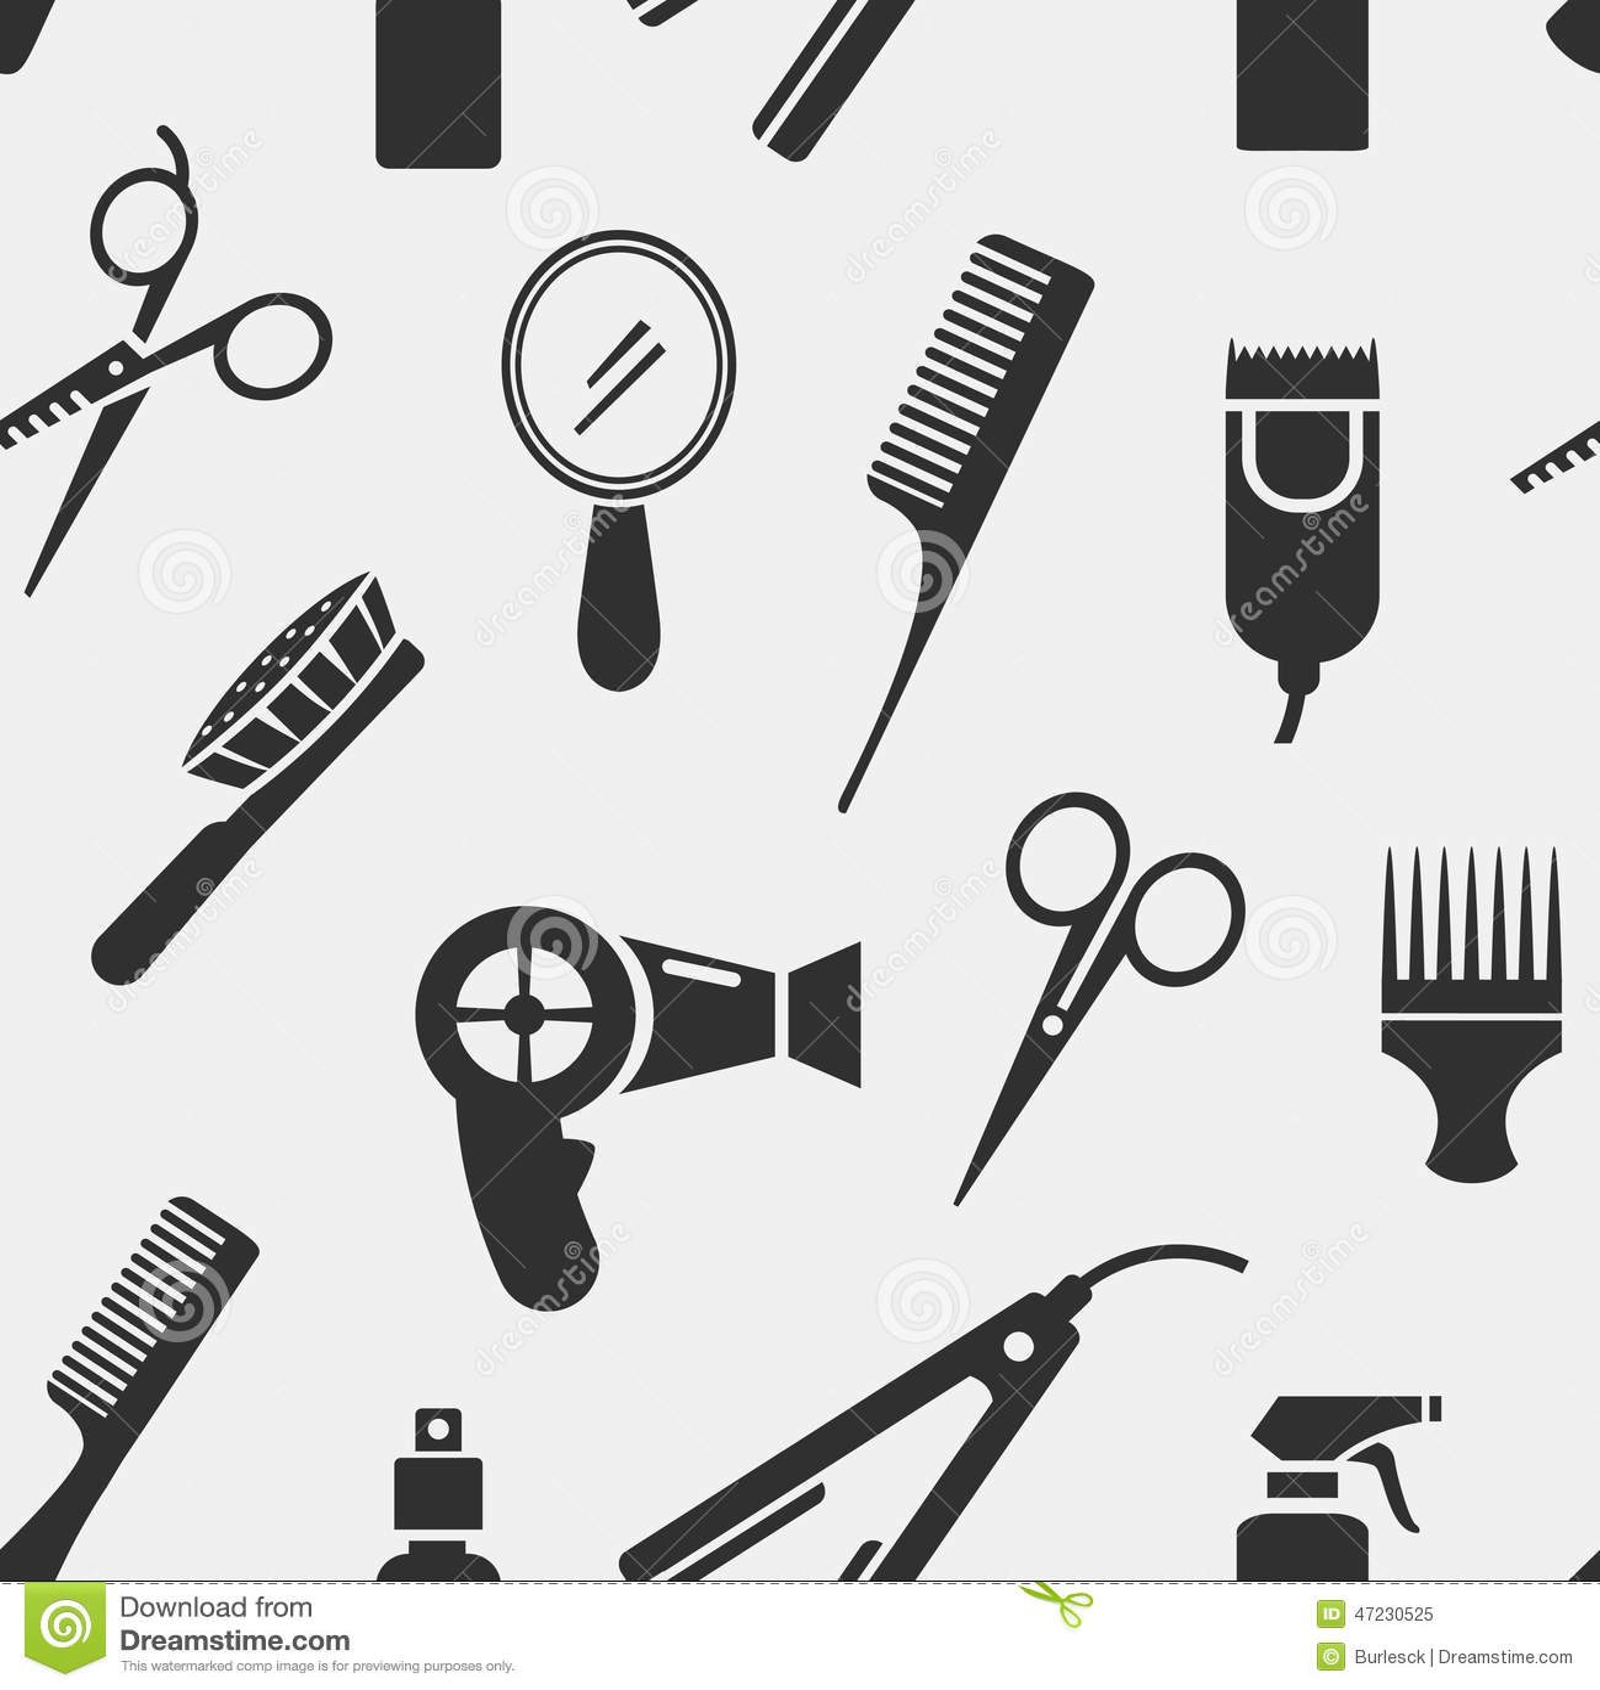 Kleurplaat Kappersspullen Silhouette Hairdressing Tools In Seamless Pattern Stock